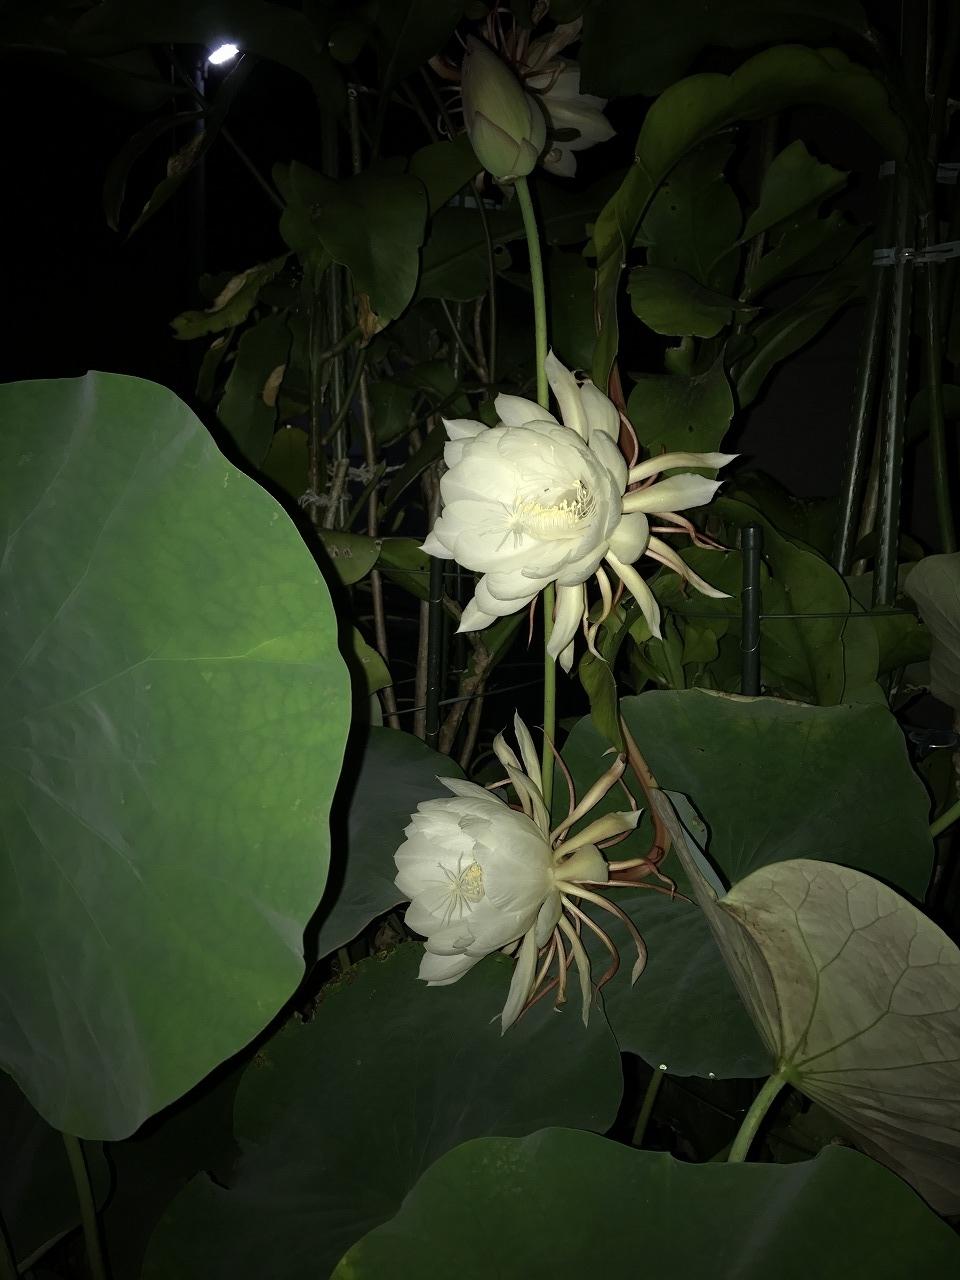 20170708-EpiphyllumOxpetalum-I02-02.jpg